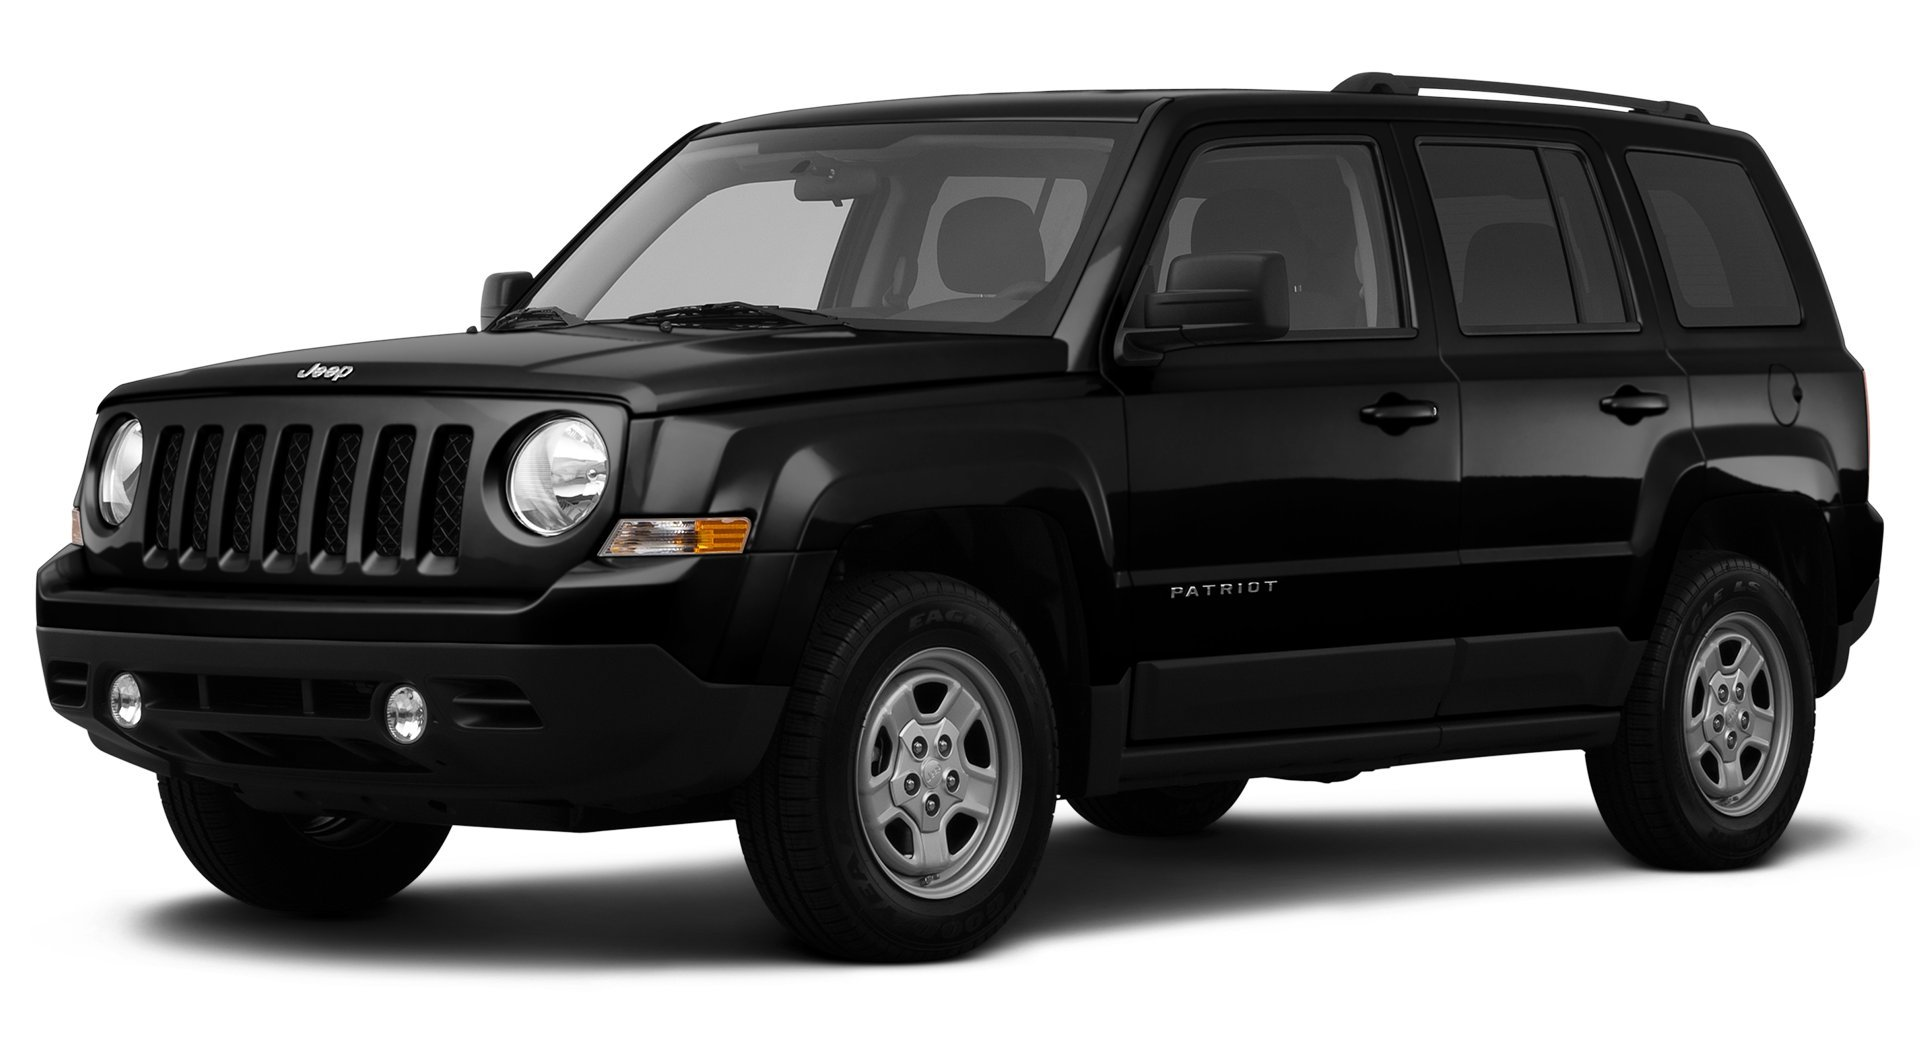 2012 Jeep Patriot Latitude, 4 Wheel Drive 4 Door ...